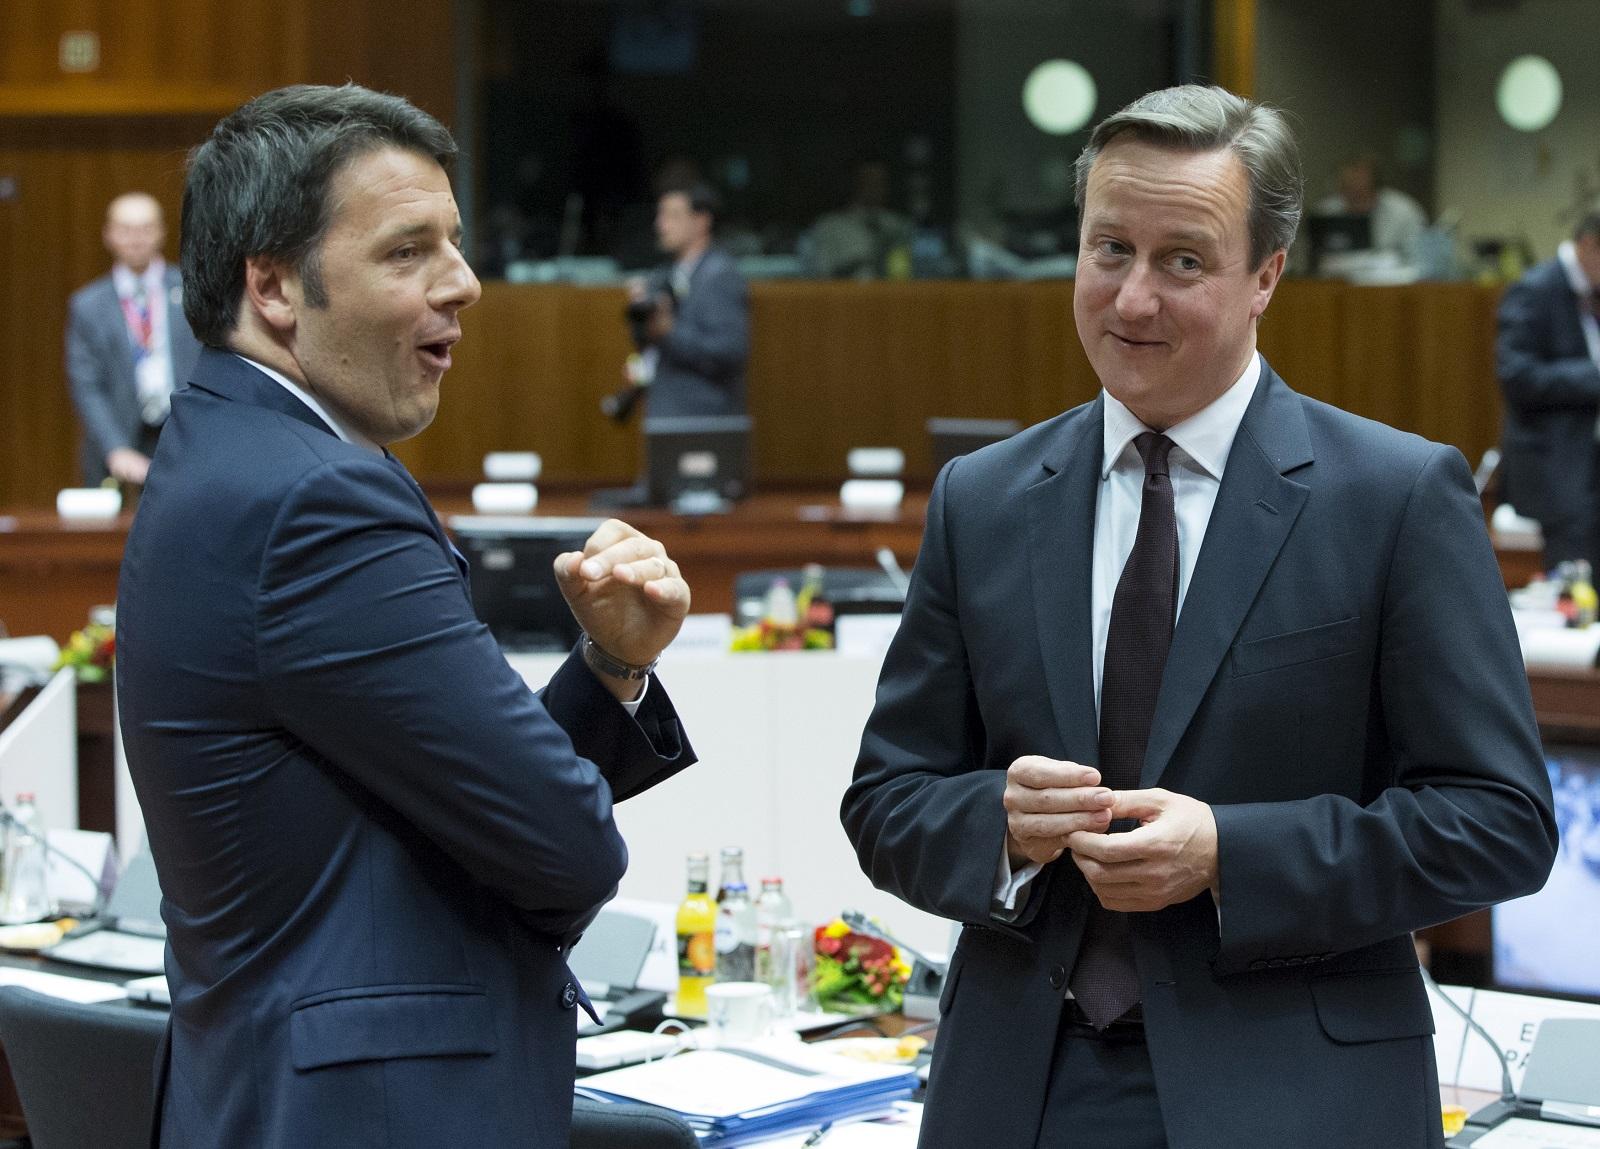 David Cameron in Brussels